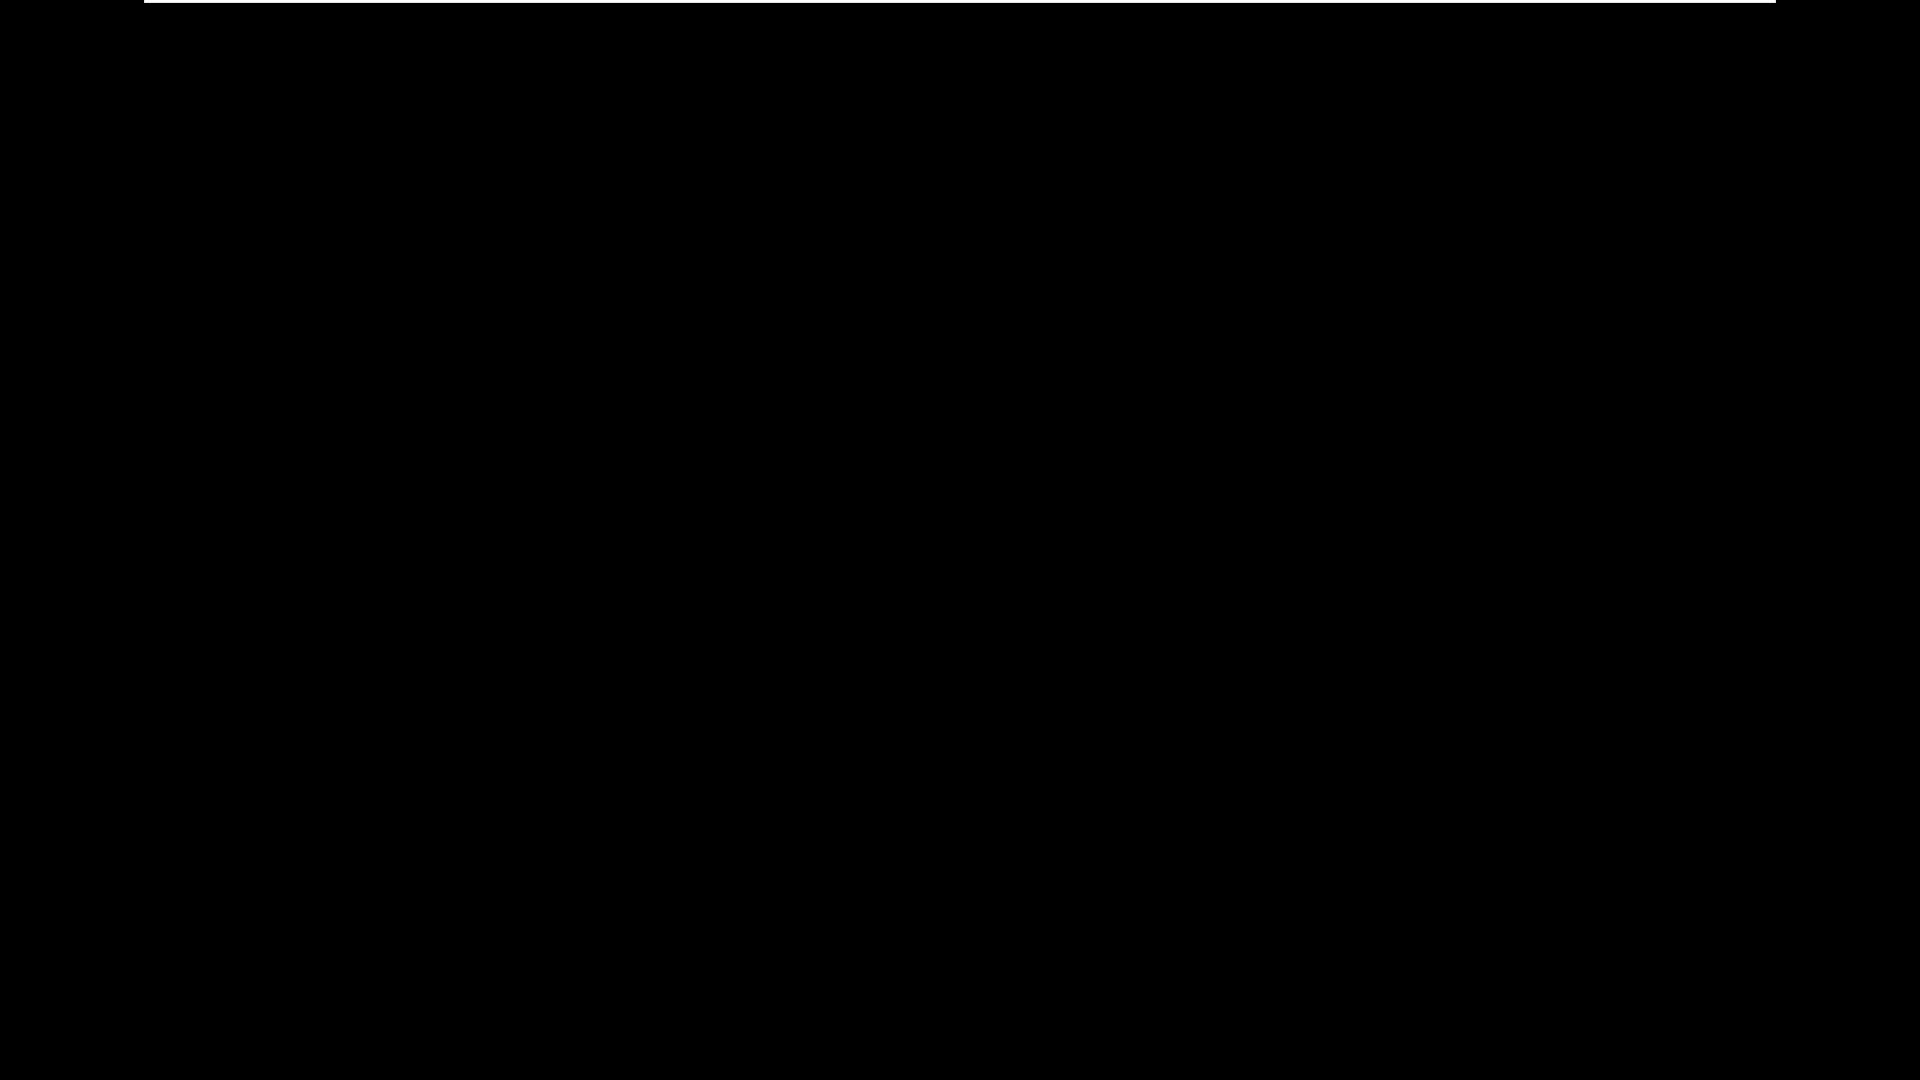 imageres.dll적용하기4.bat - 옛날 무등산님 아이콘 적용 - 윈도우 10 버전 1809 - 재부팅하면 검은 화면으로 5분 이상 있네요. 먹통 2021-04-01_155140.jpg